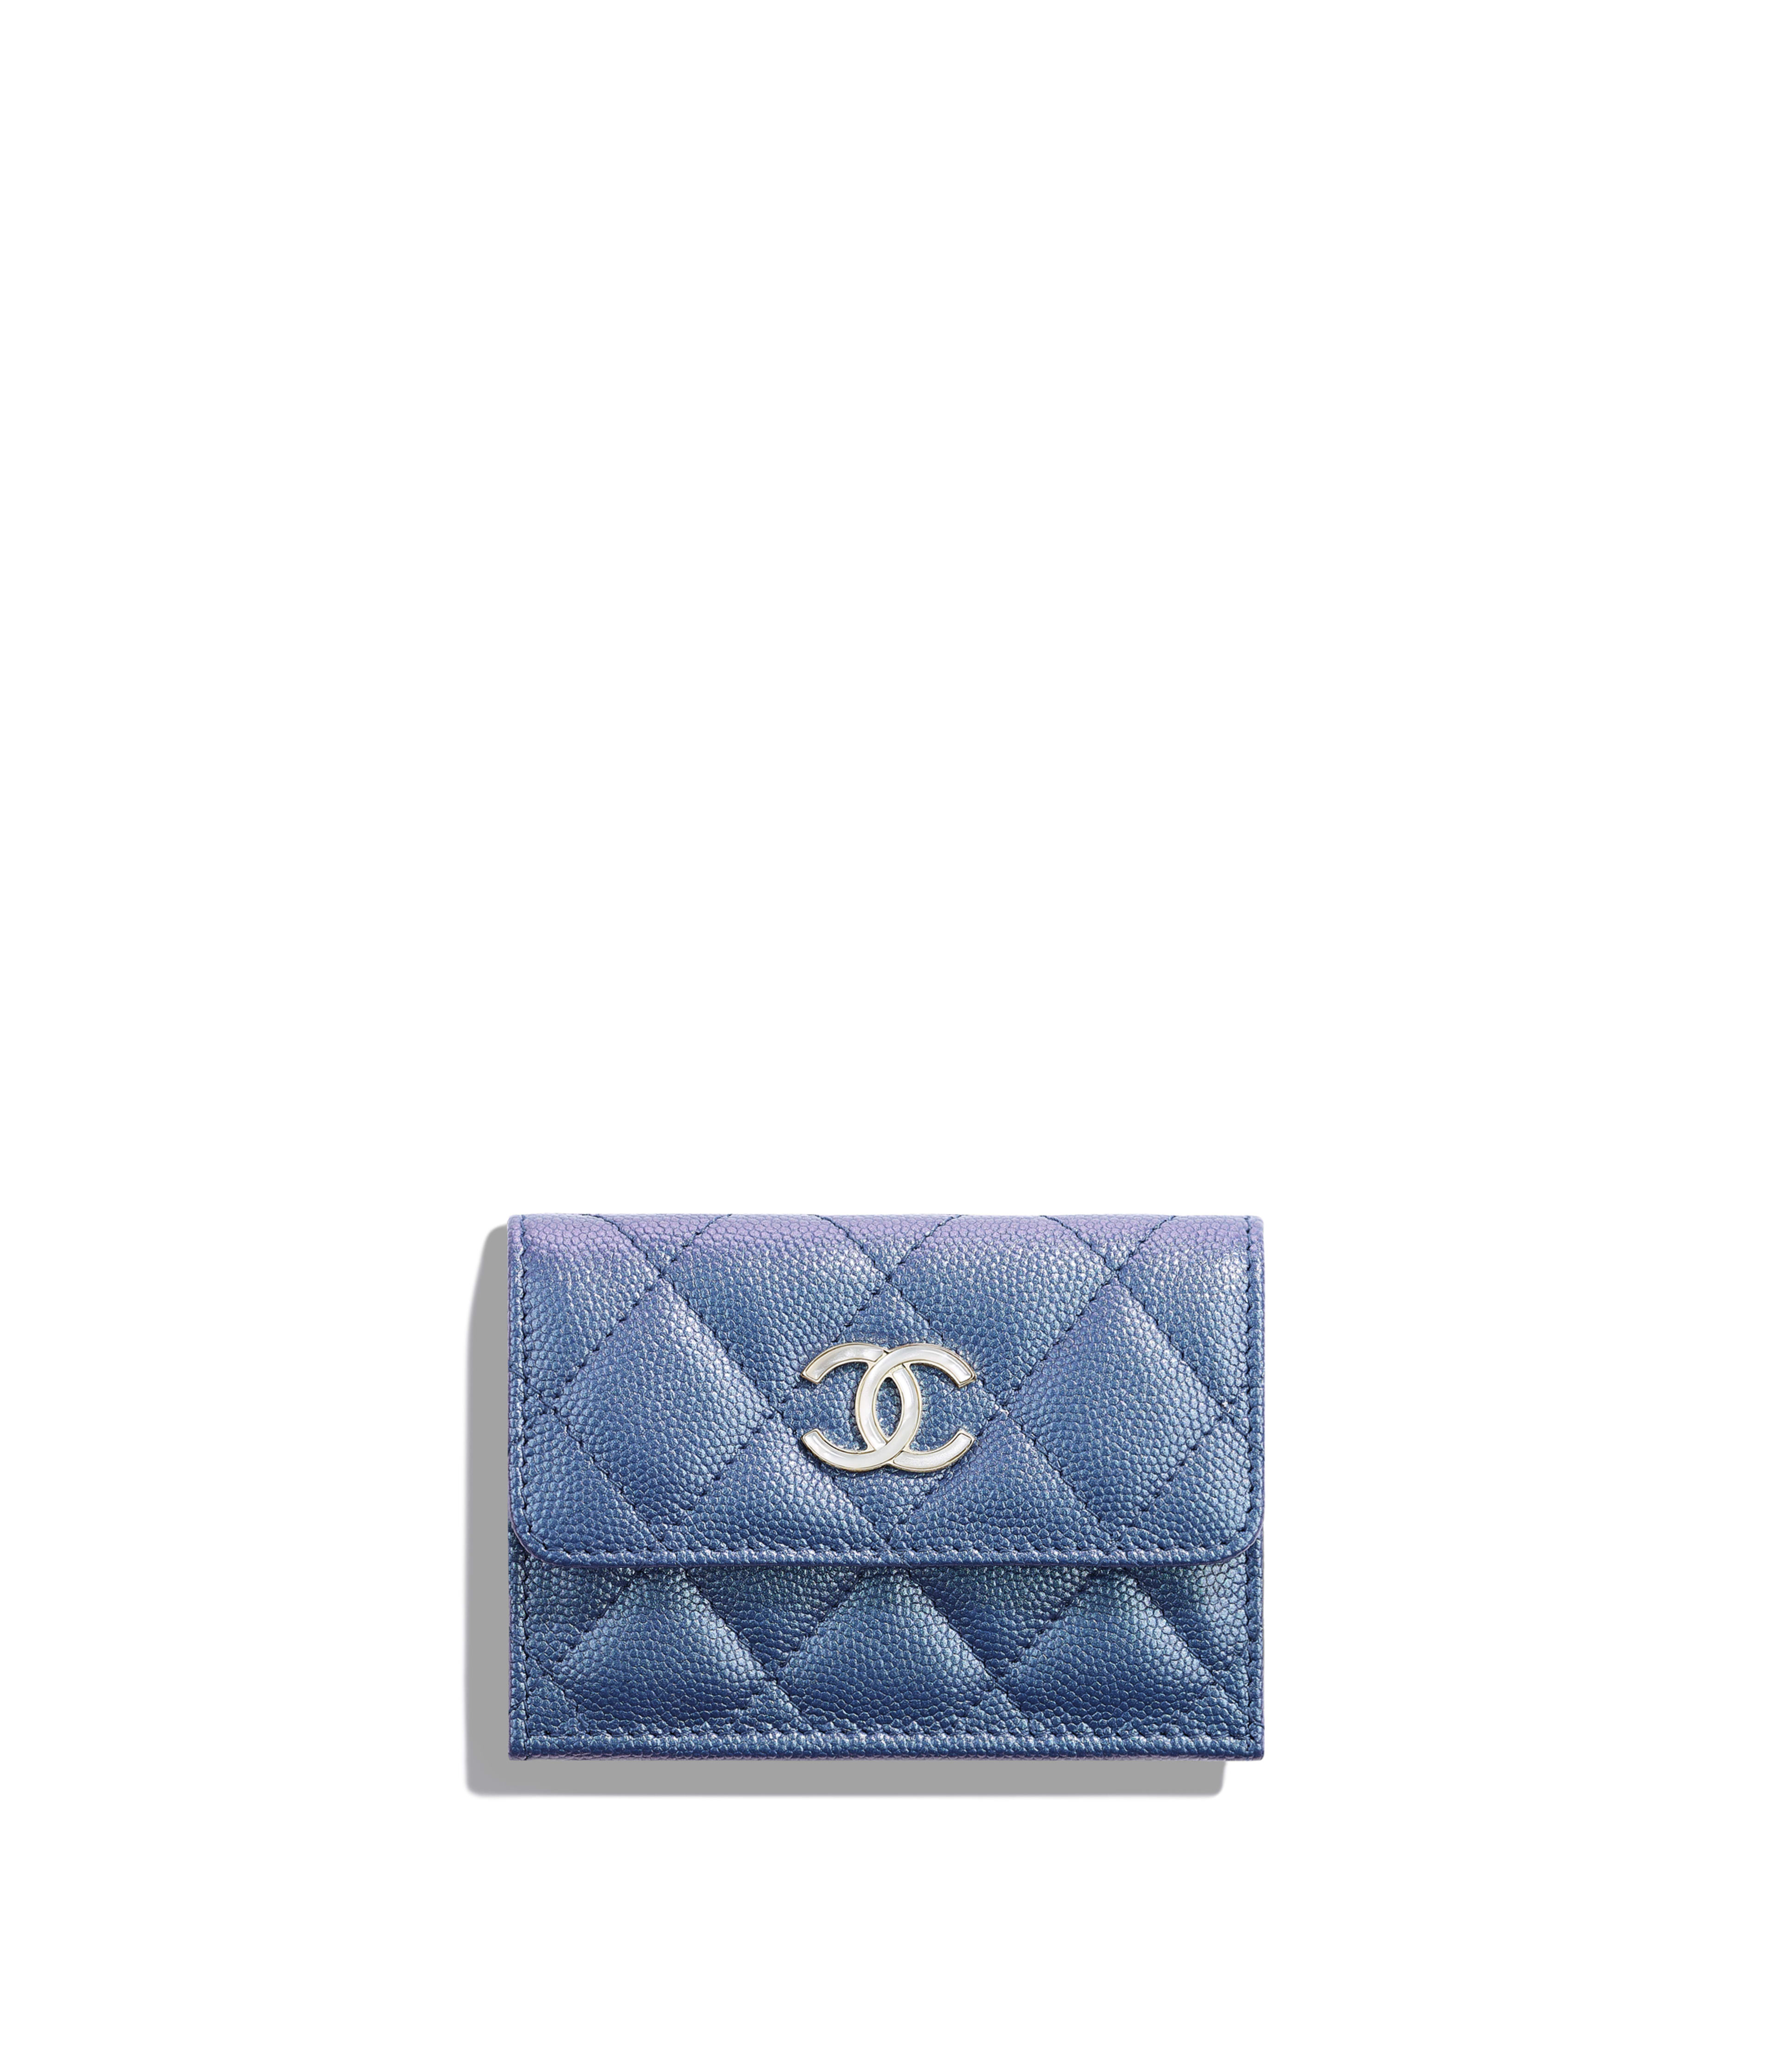 b729eb55a9dcf2 Small Flap Wallet Iridescent Grained Lambskin & Gold-Tone Metal, Dark Blue  Ref. AP0310B00483N0901